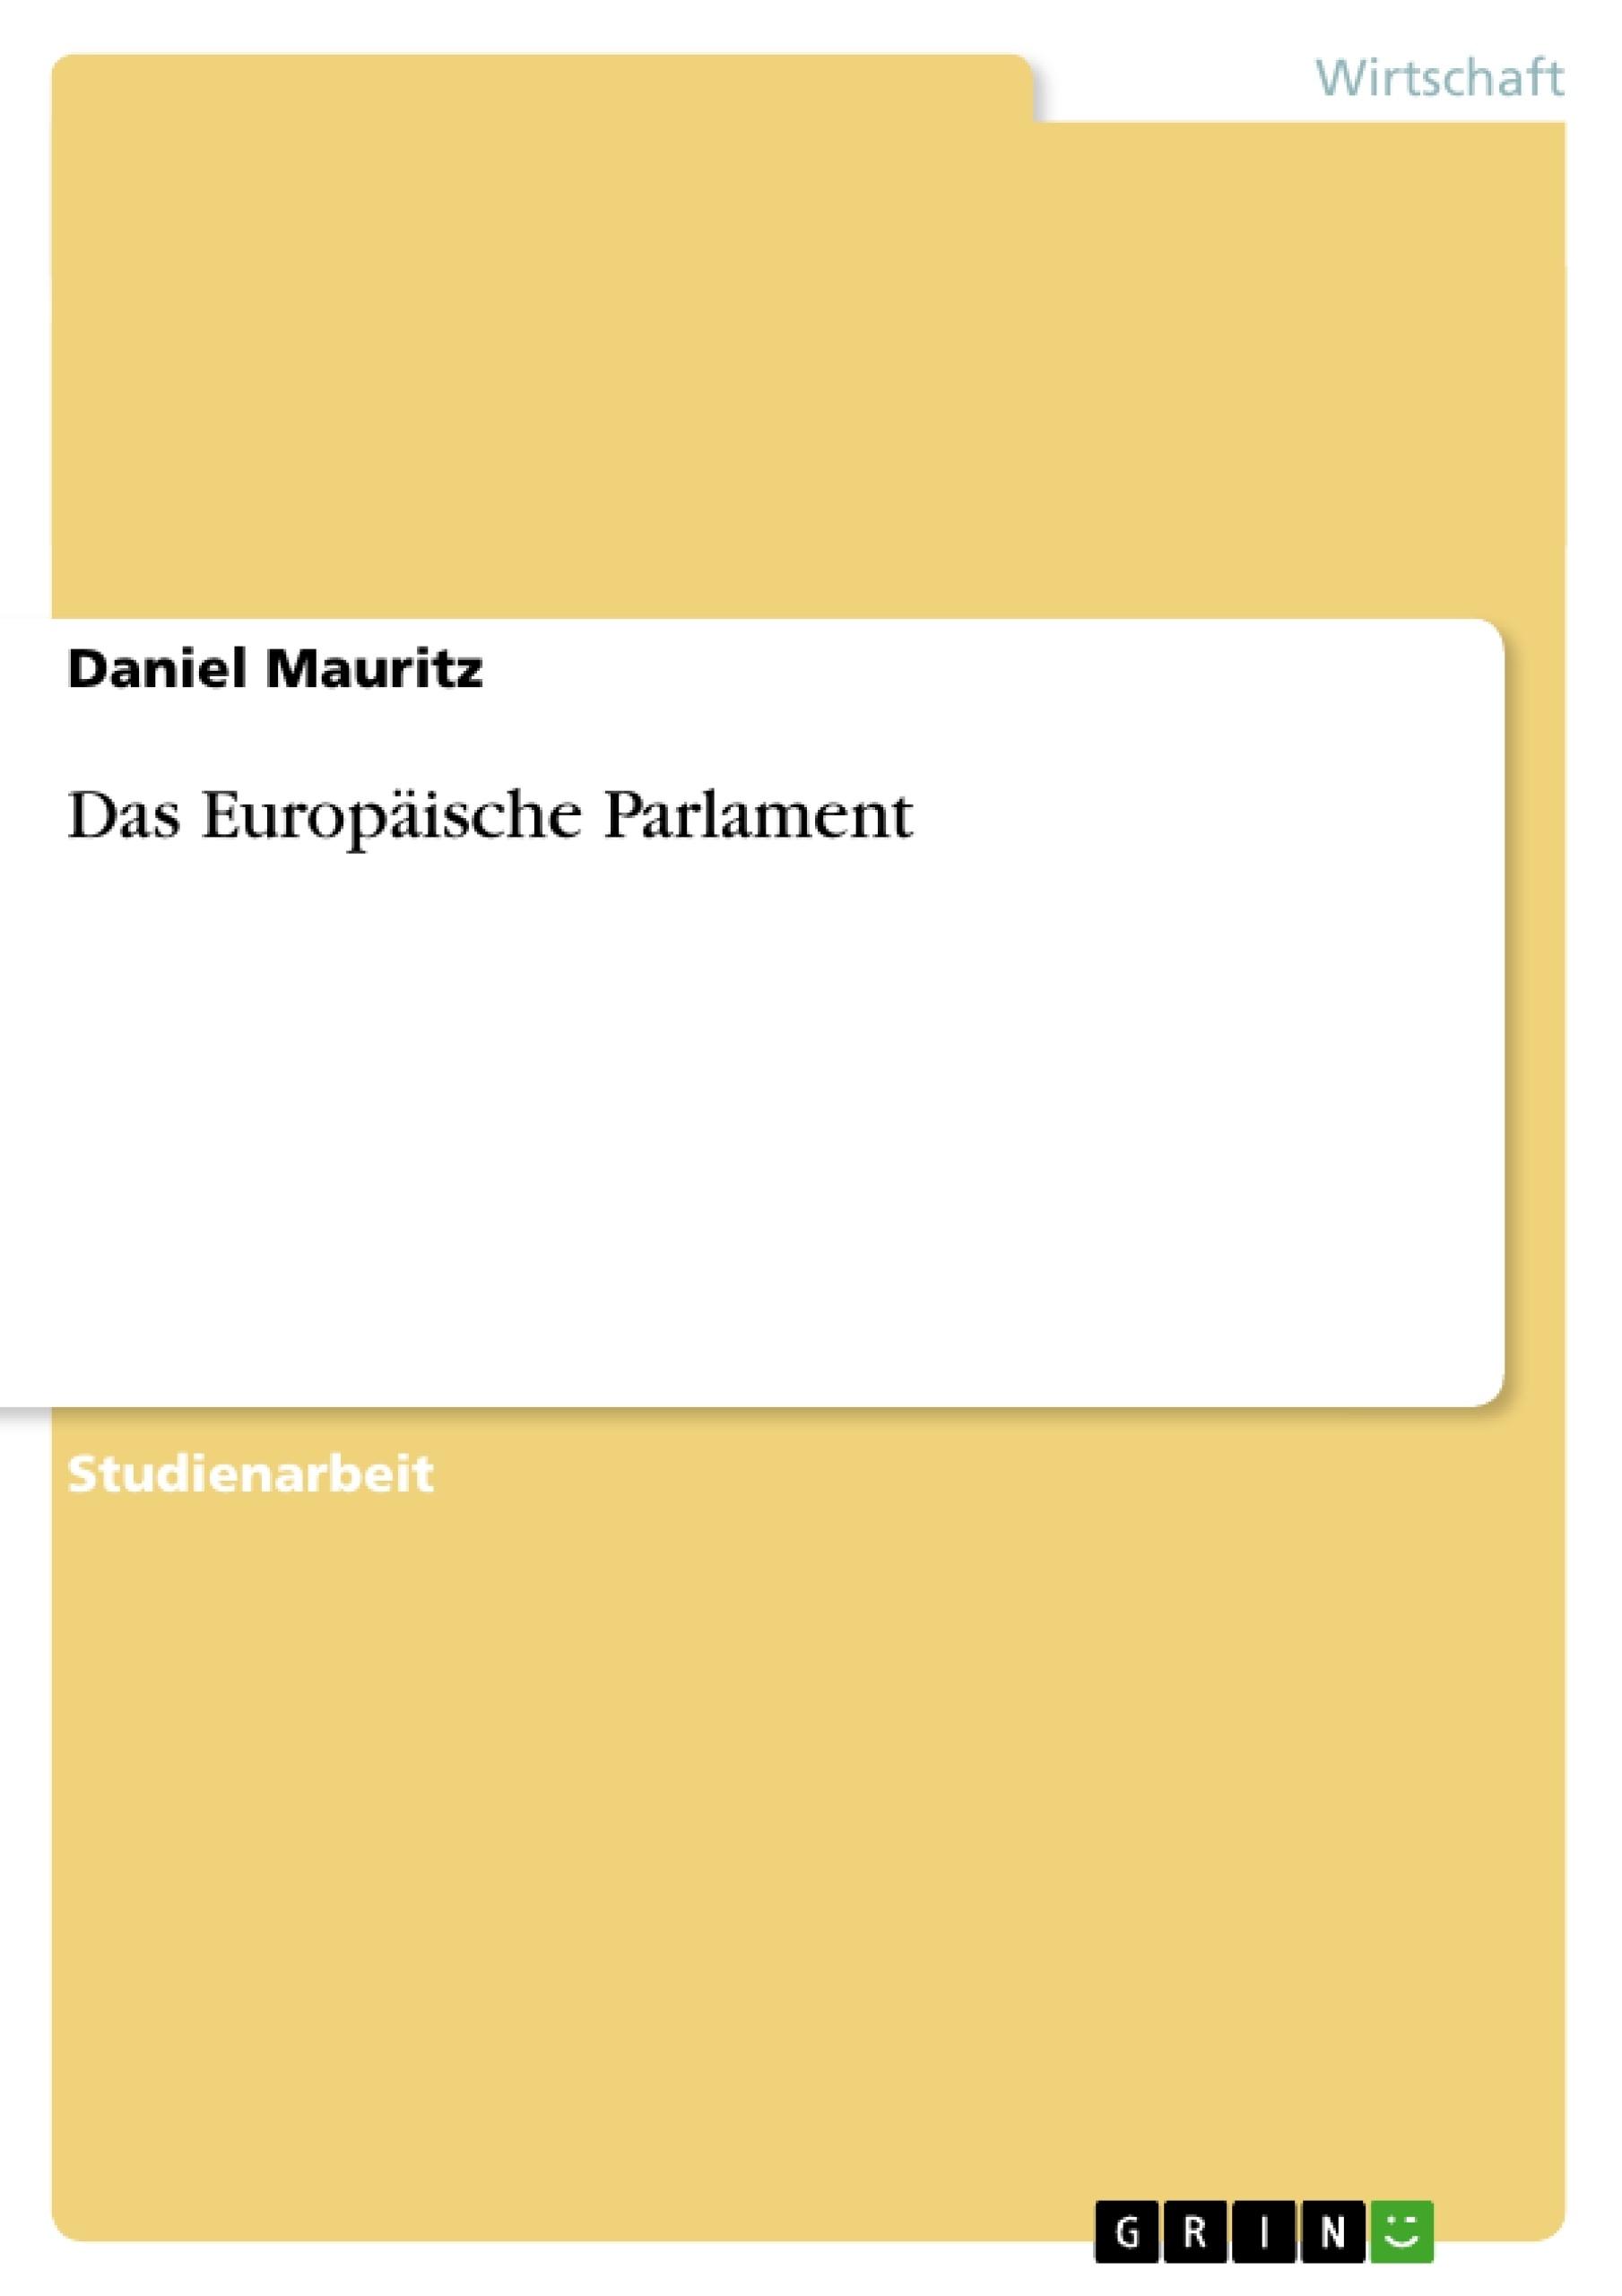 Titel: Das Europäische Parlament